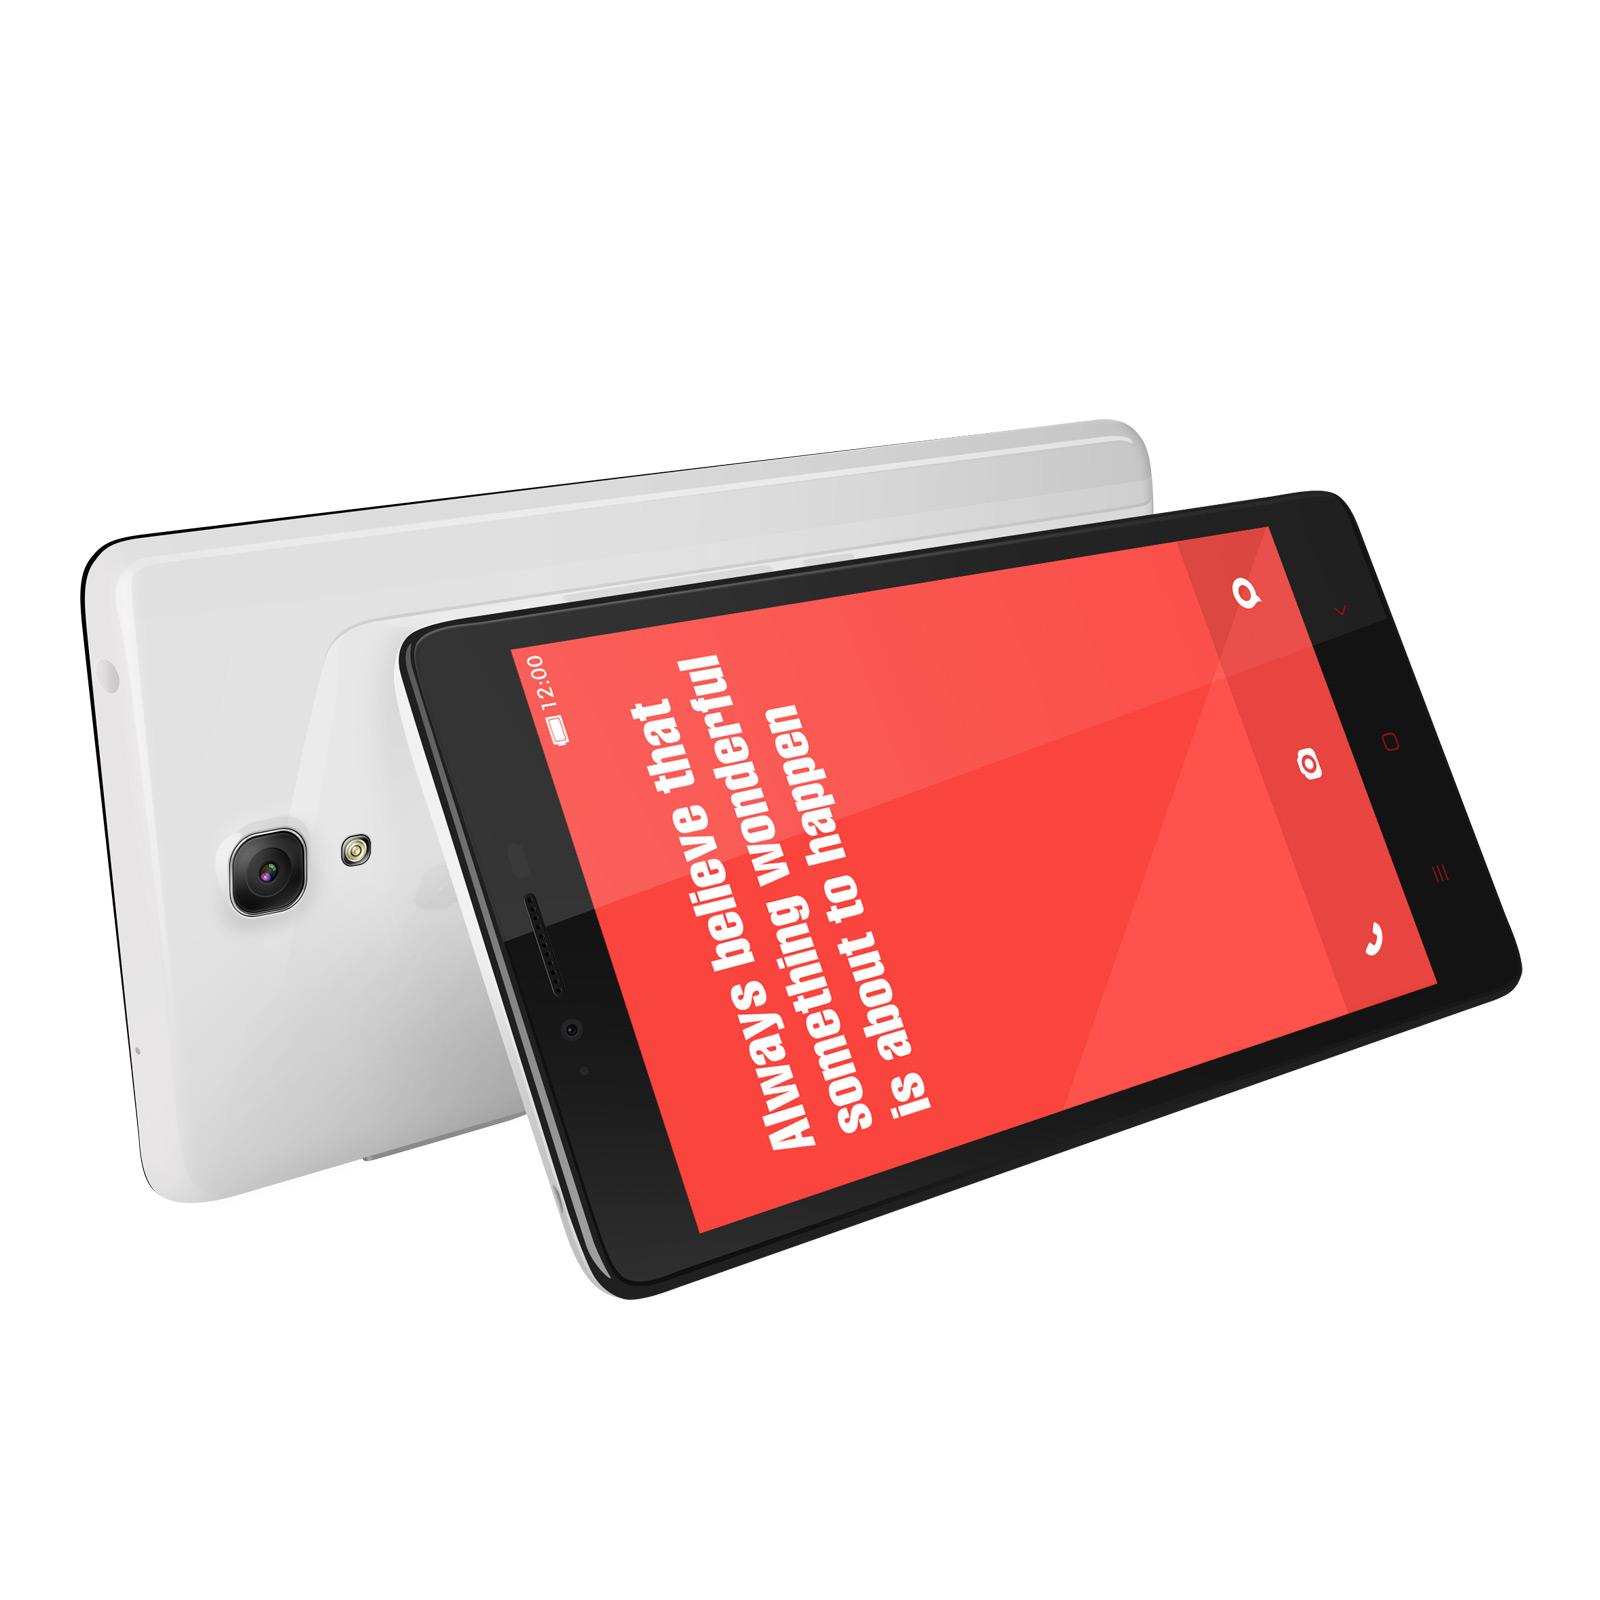 Redmi Note Prime Price Buy Online Mi India Love Mei Powerful Bumper Case Xiaomi 2 Original 100